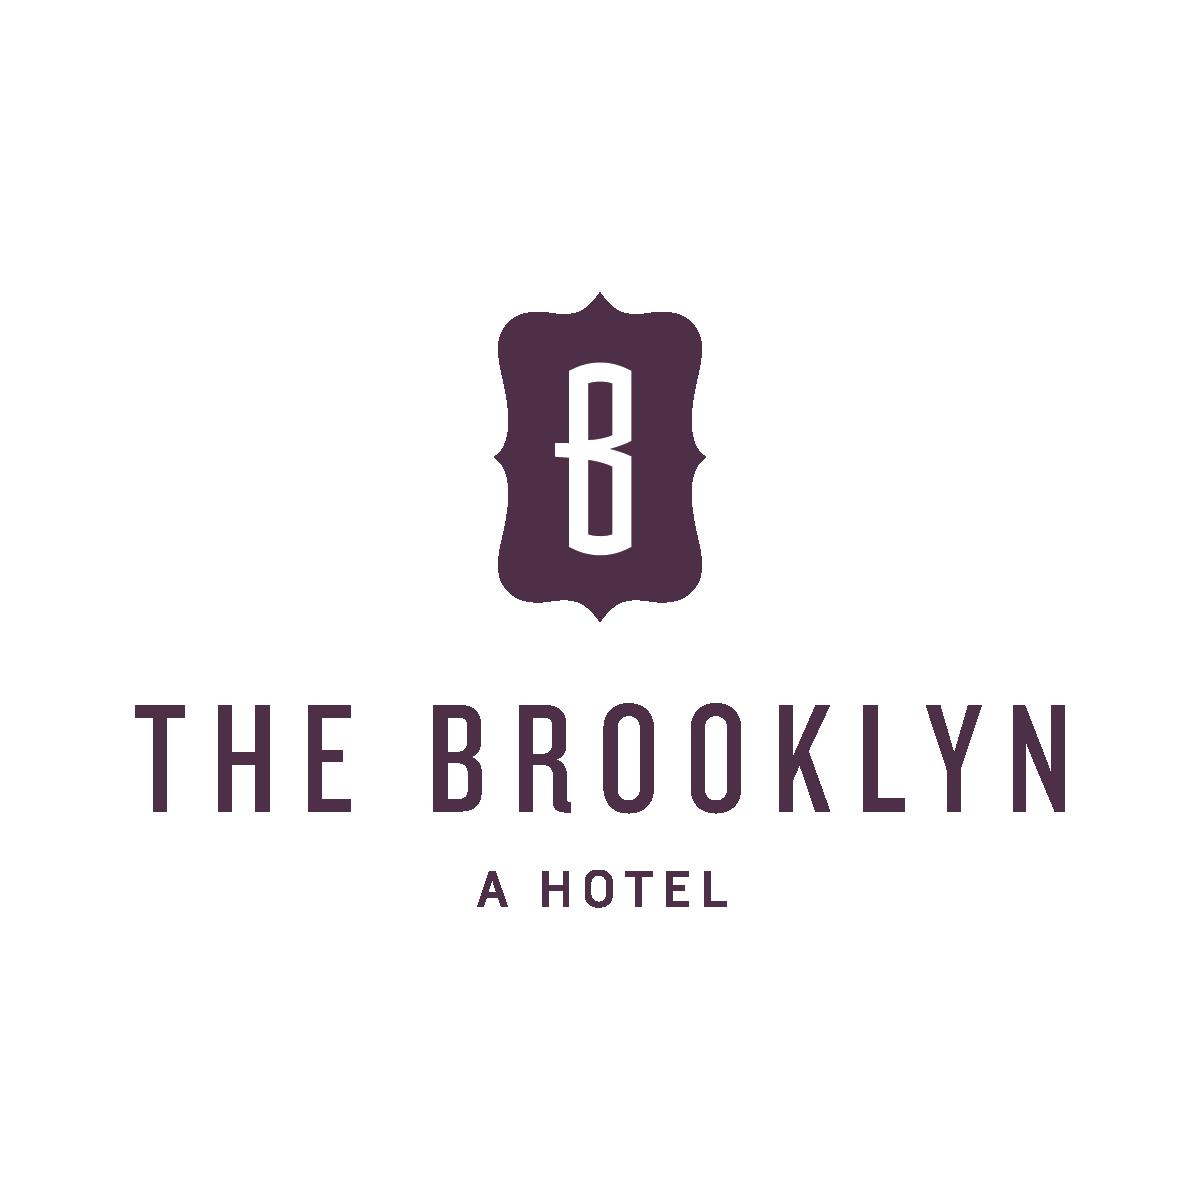 The Brooklyn